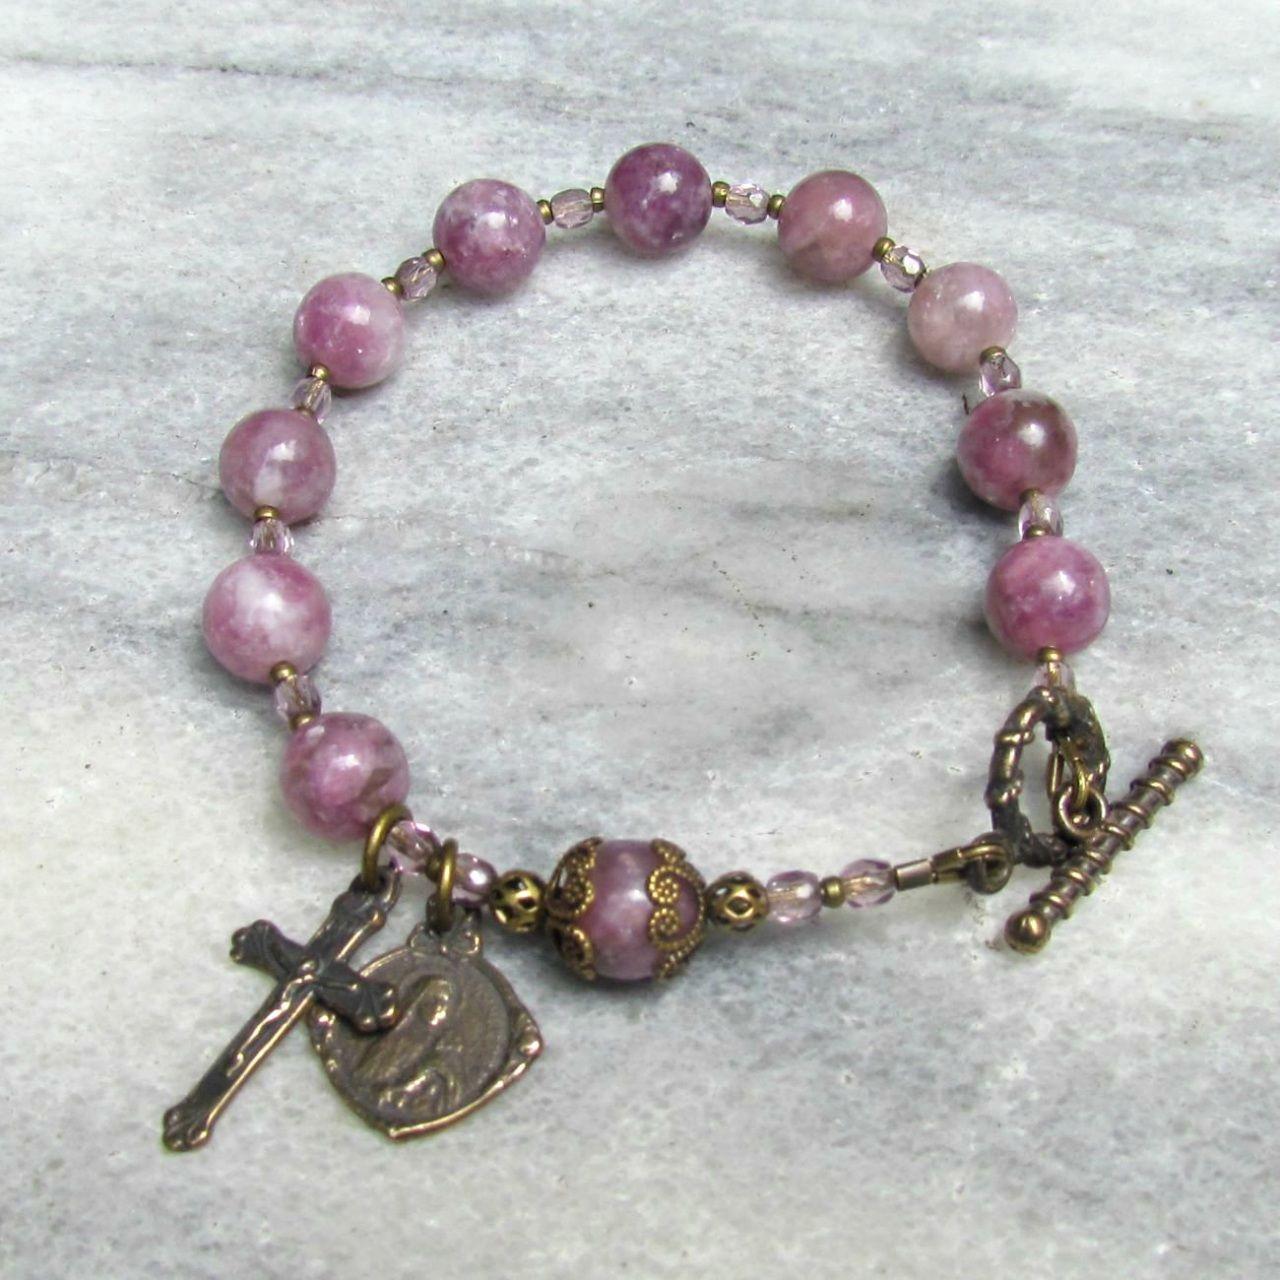 A handmade Catholic rosary bracelet for men and women The vintage